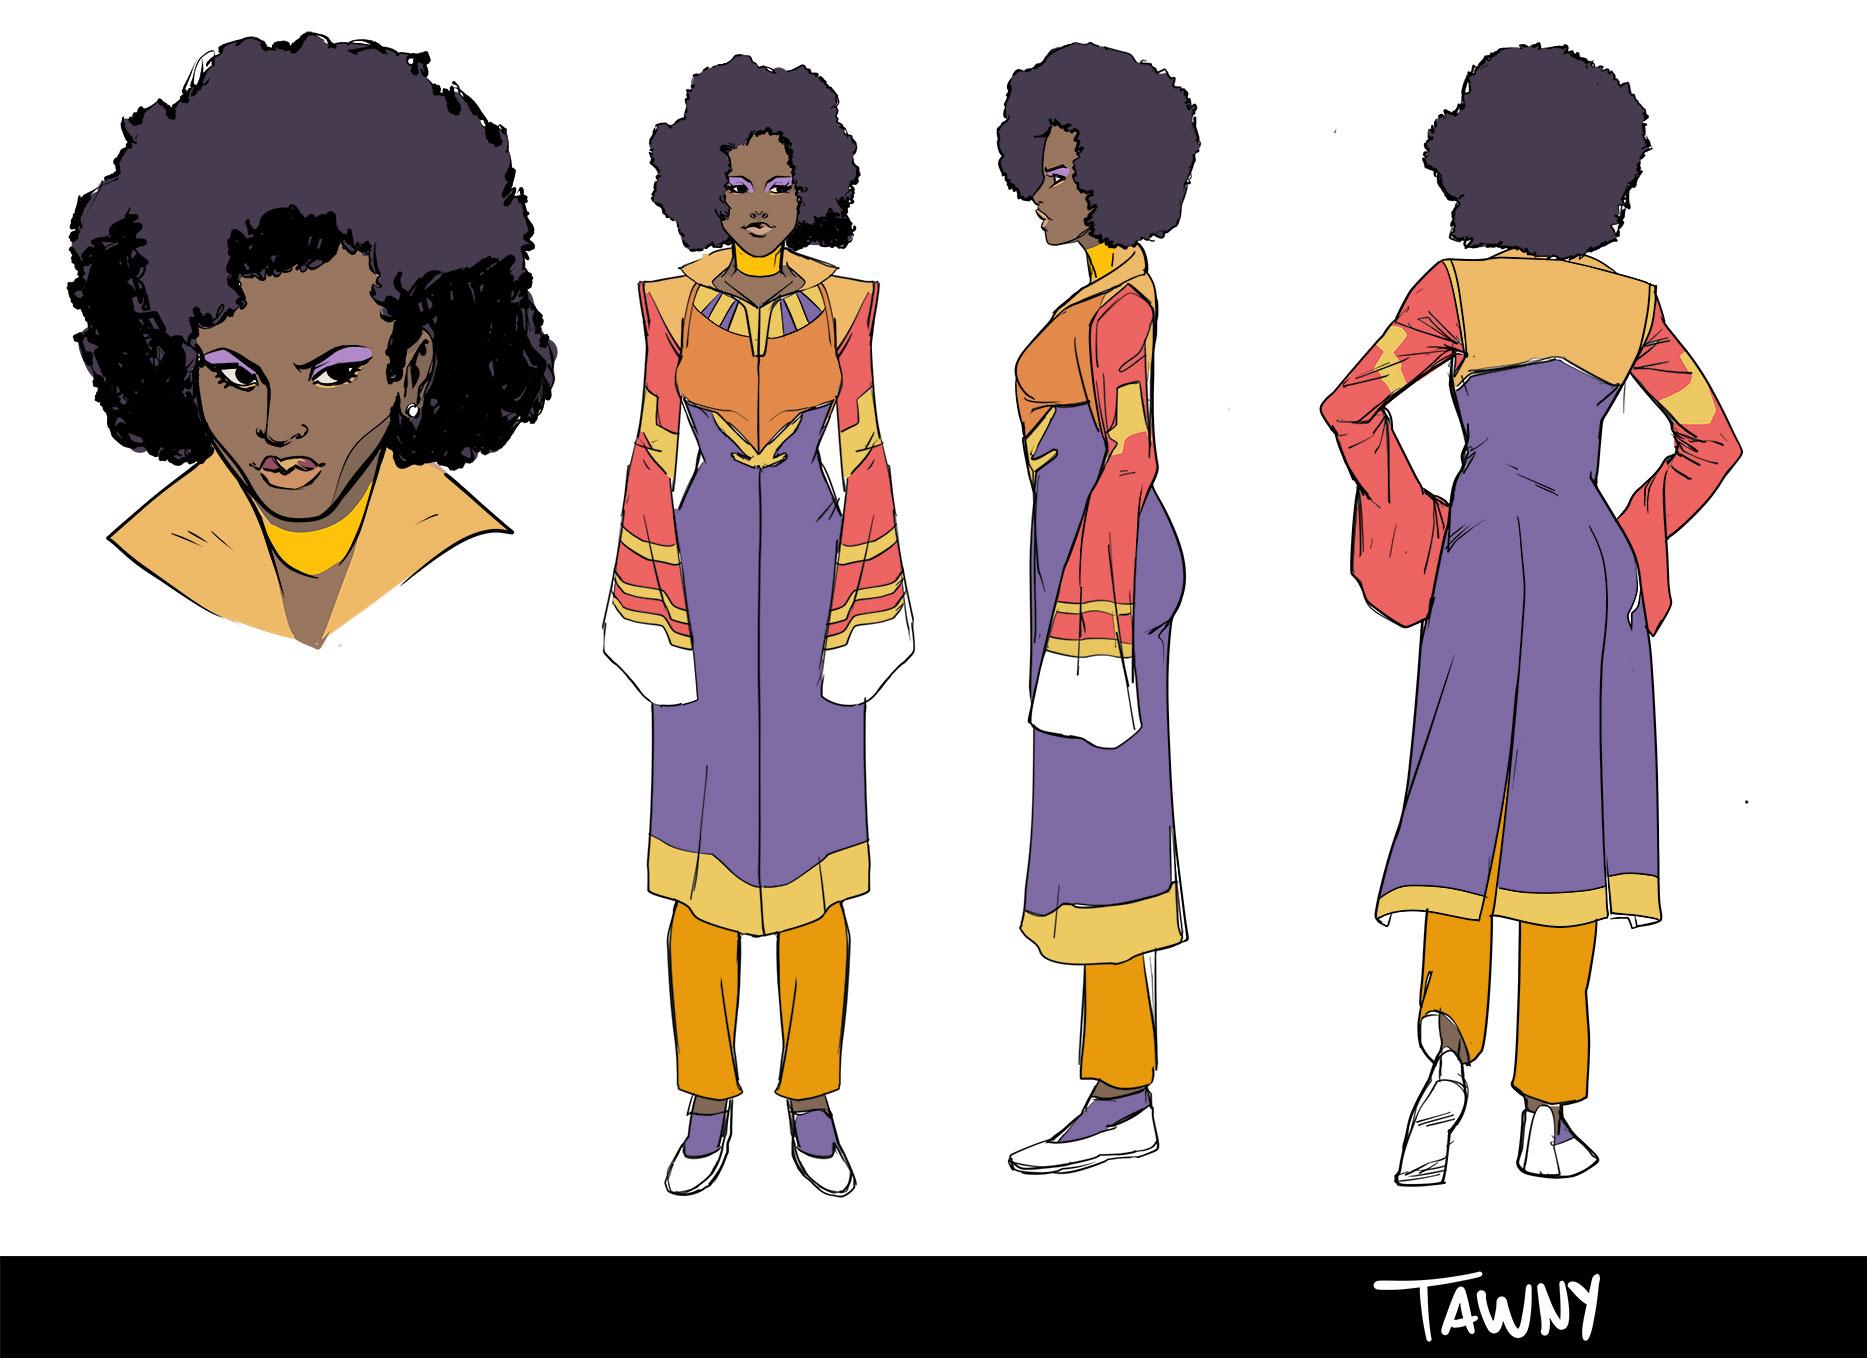 Tawny.jpg